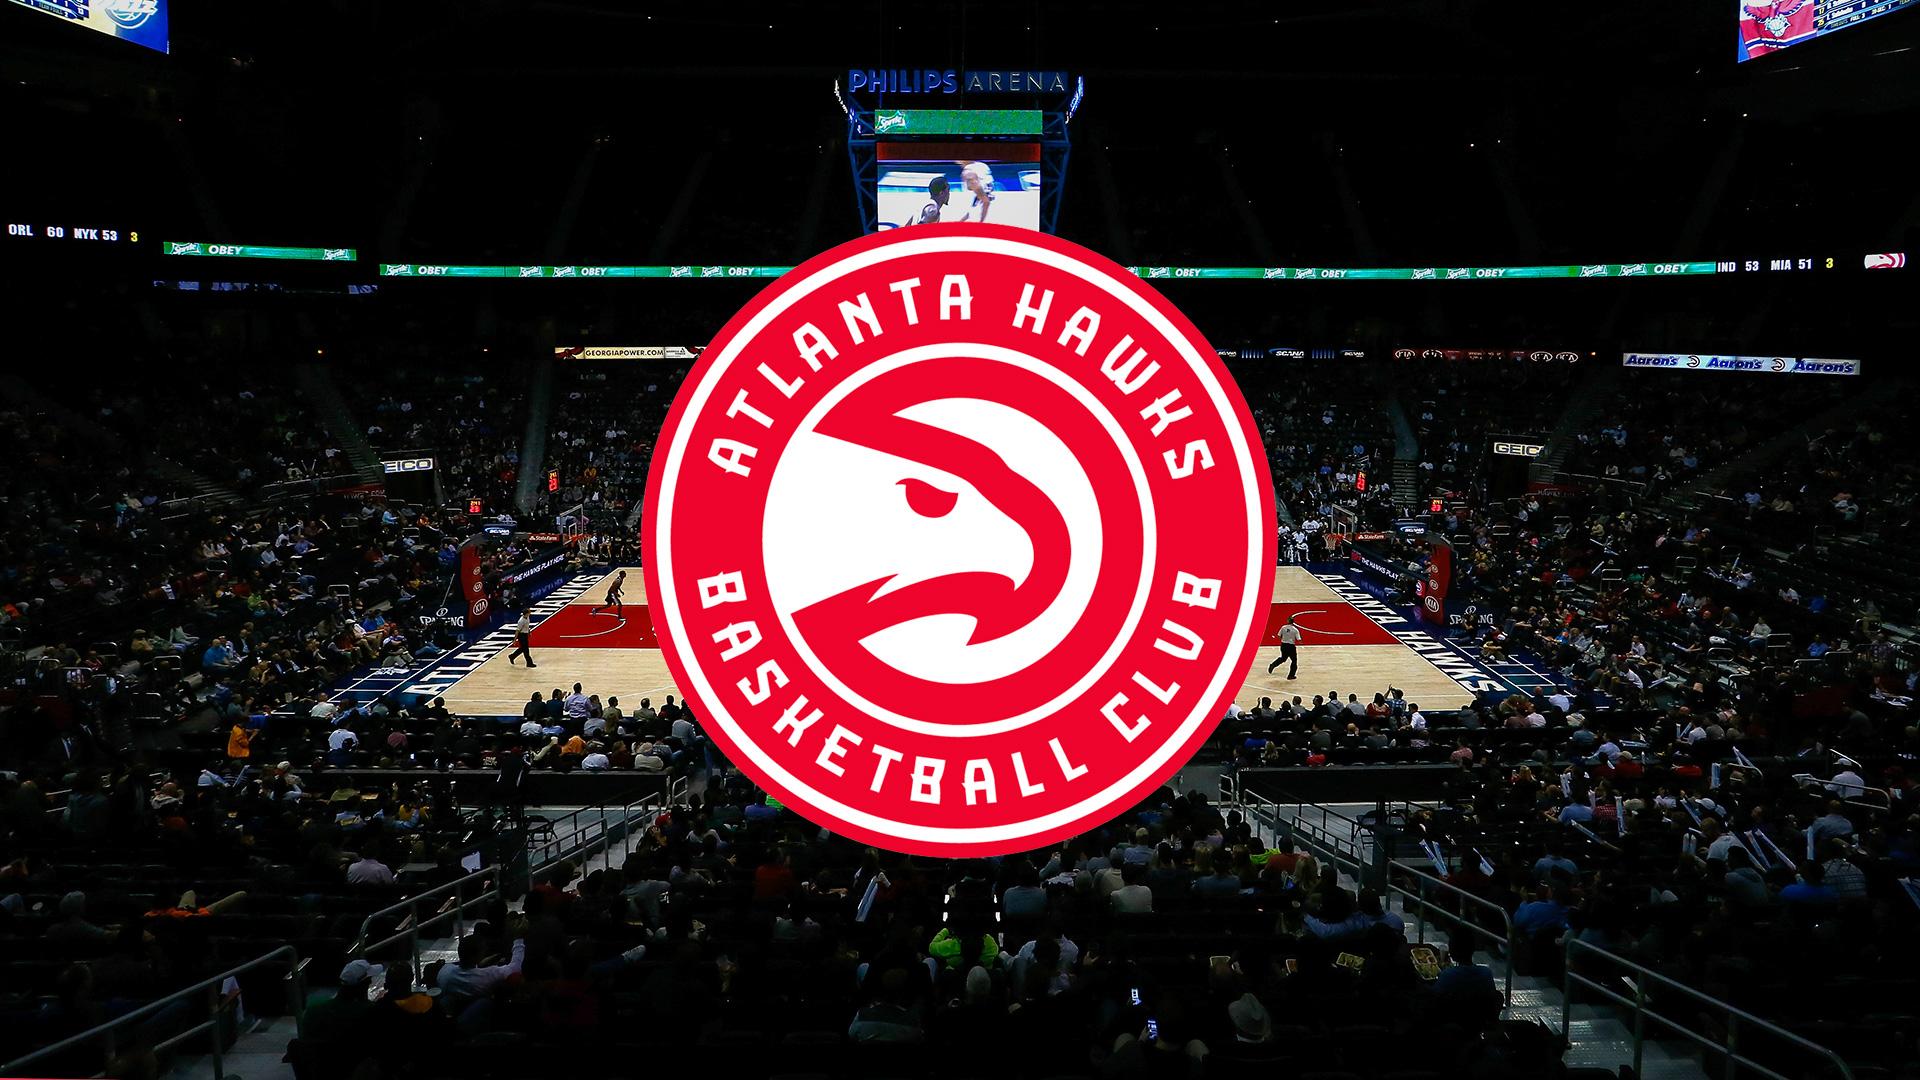 Atlanta Hawks Wallpaper Hd Atlanta Hawks Wallpaper Hd Pixelstalk Net